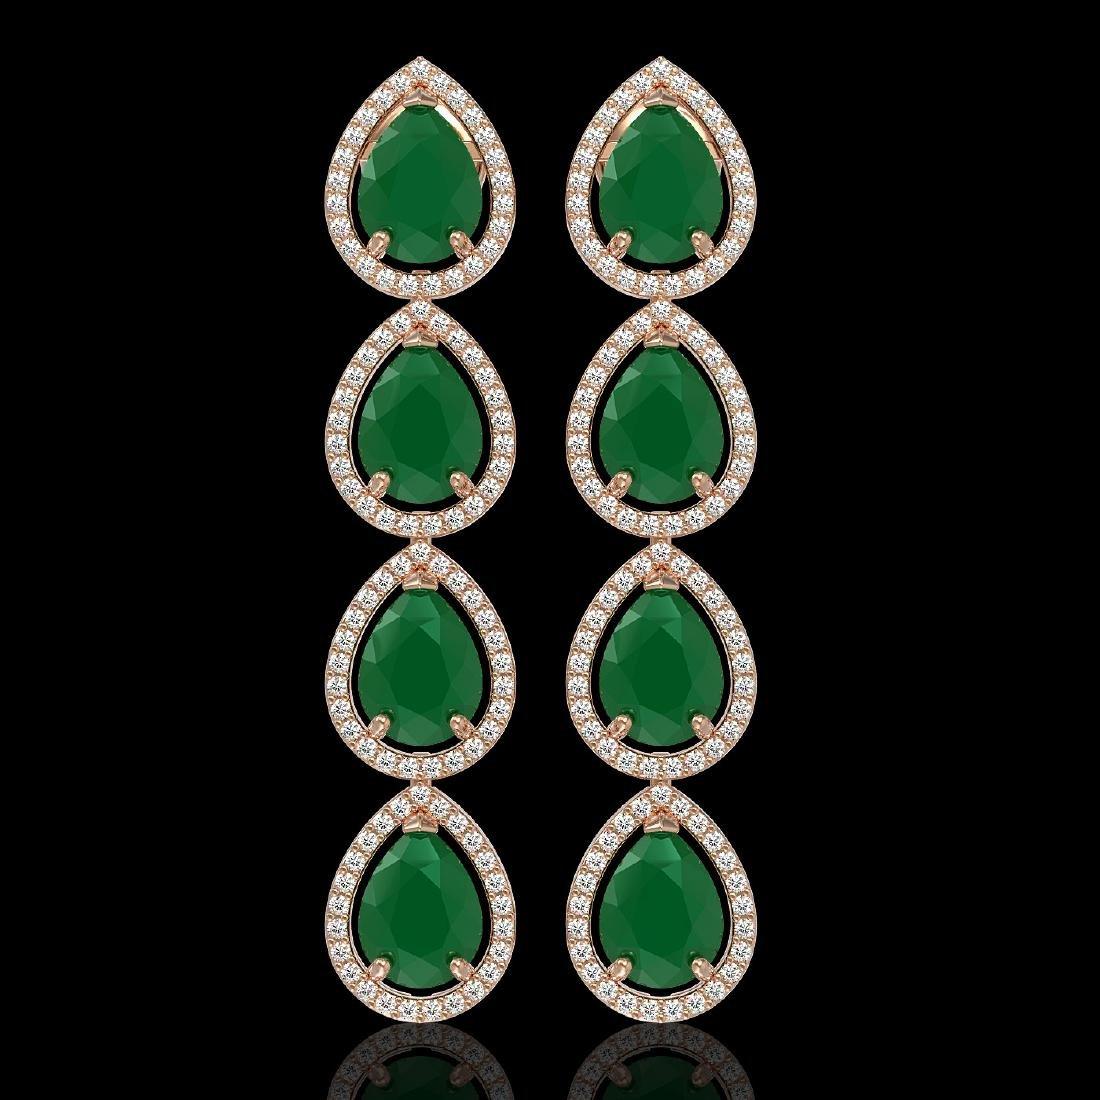 16.01 CTW Emerald & Diamond Halo Earrings 10K Rose Gold